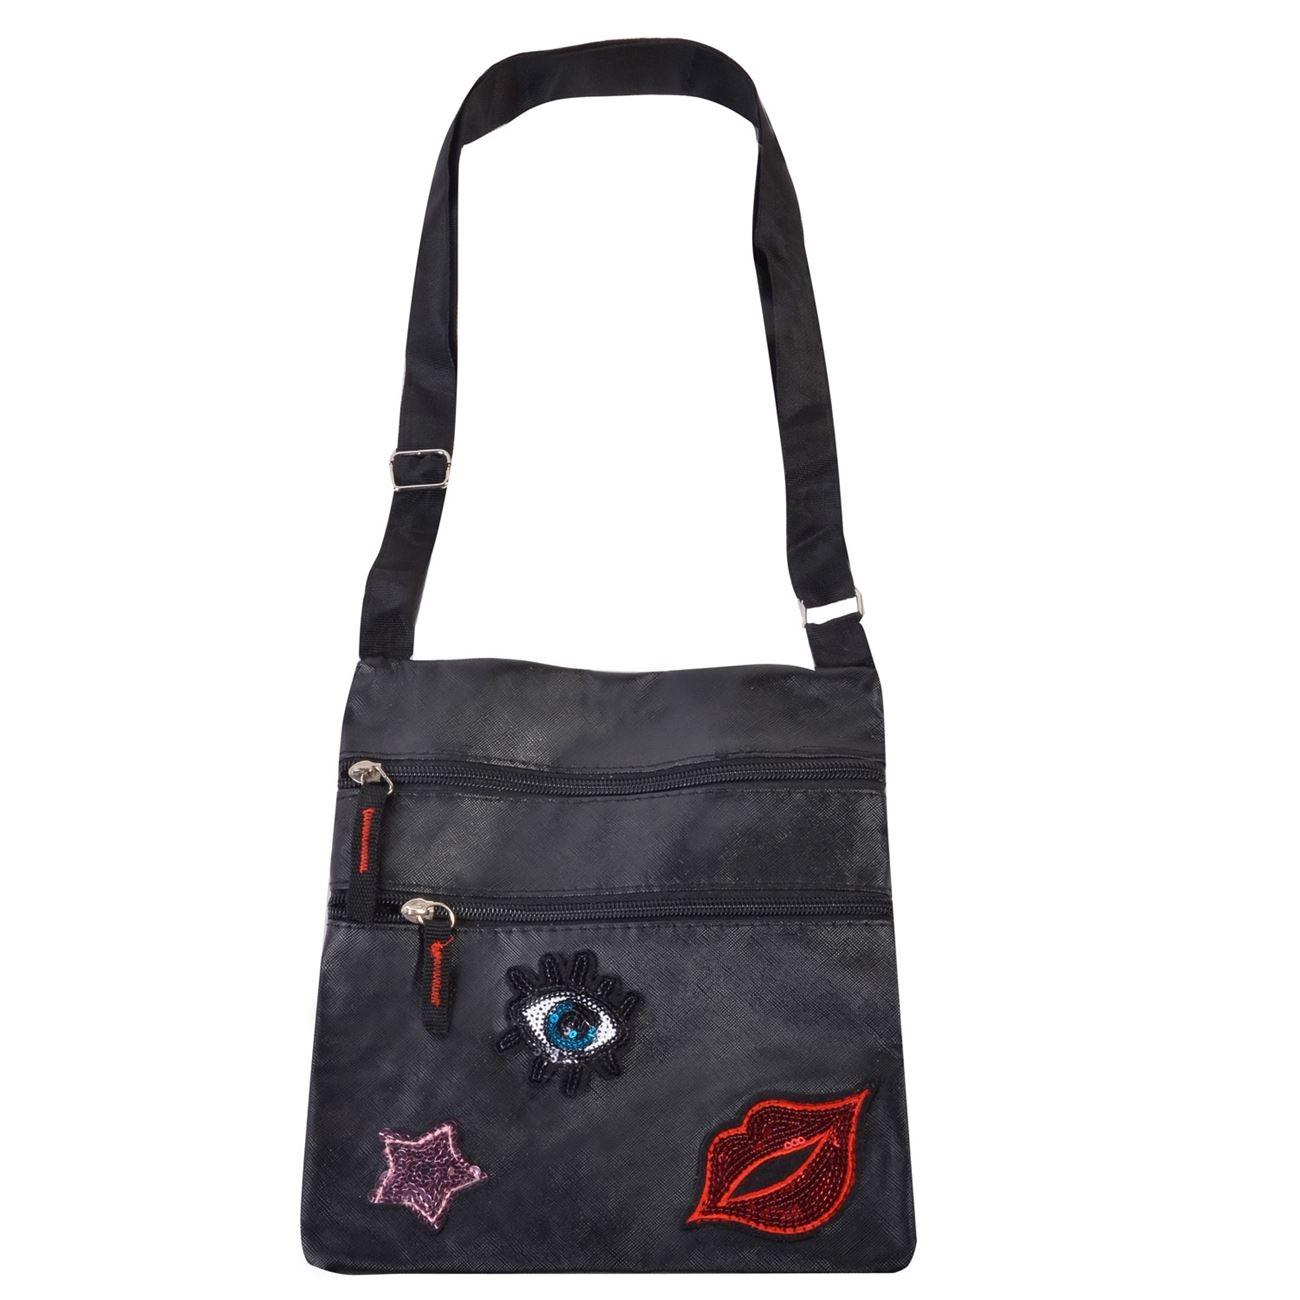 8d0dfa2133 Τσάντα Μαύρη Patch 21x23   Τσάντες Ώμου-Χιαστί